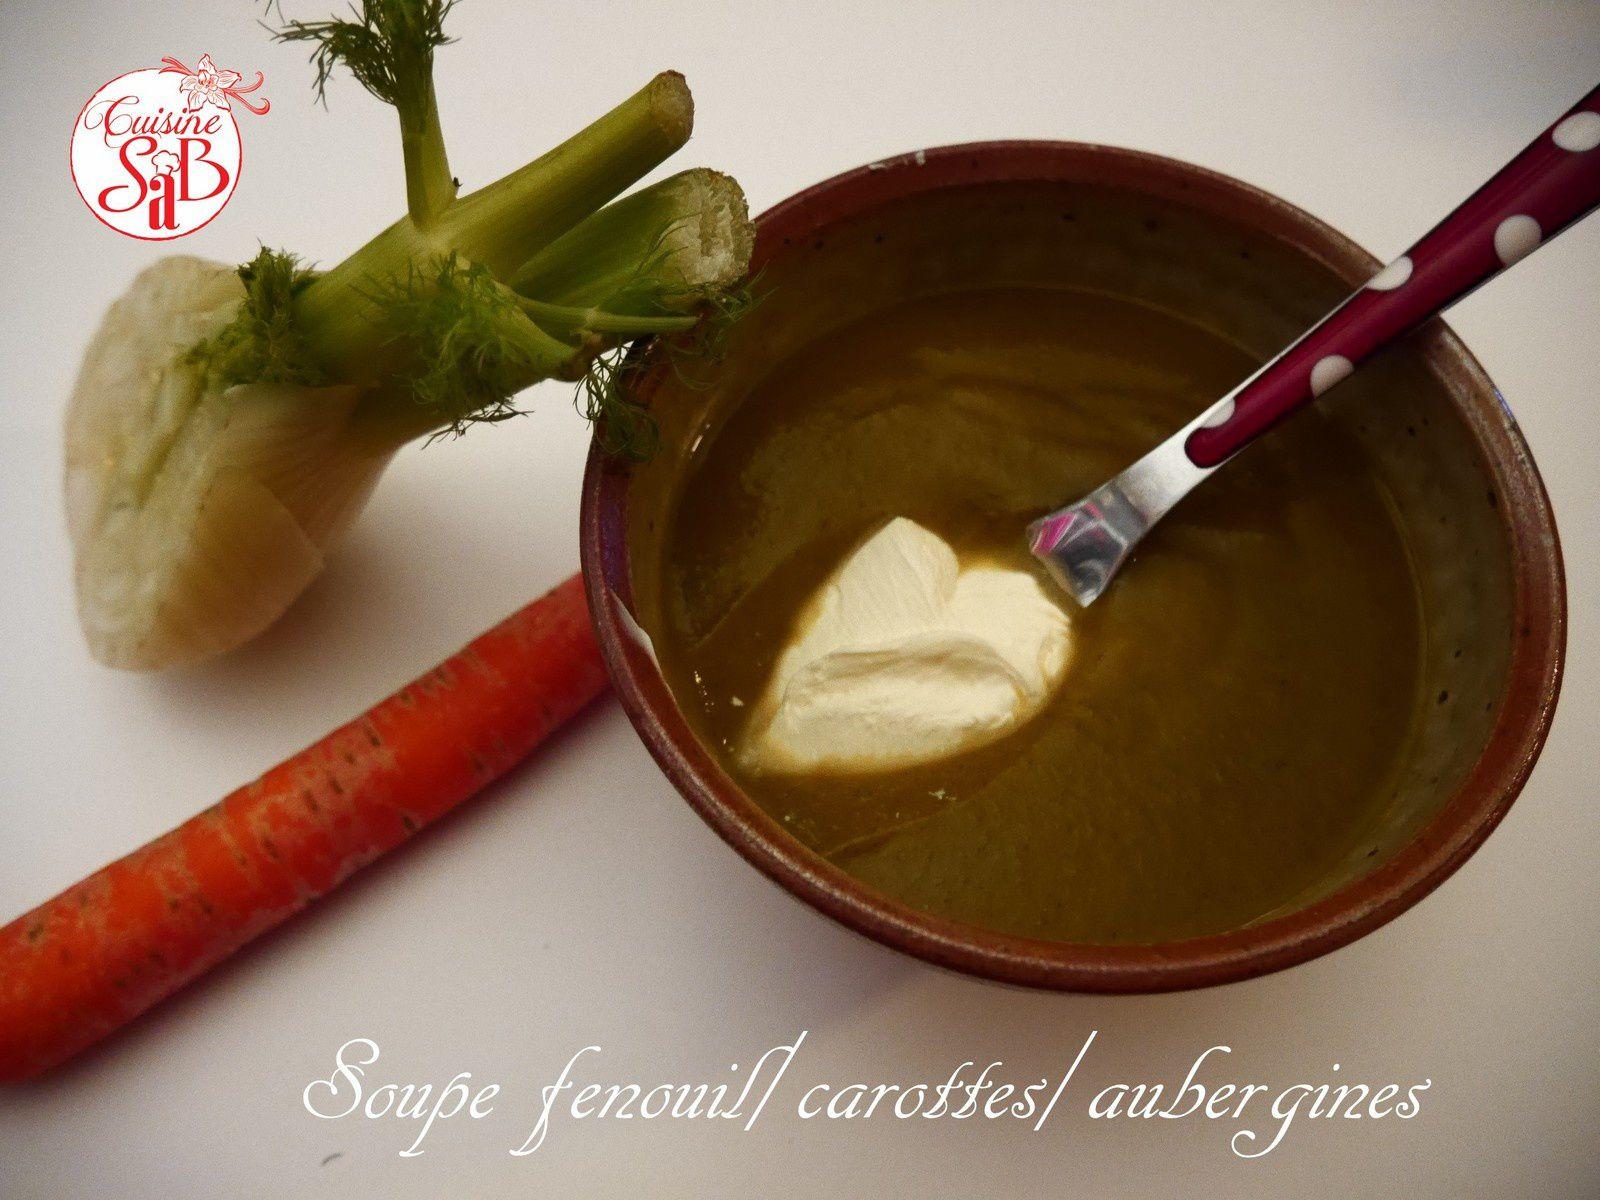 Soupe fenouil/carottes/aubergines